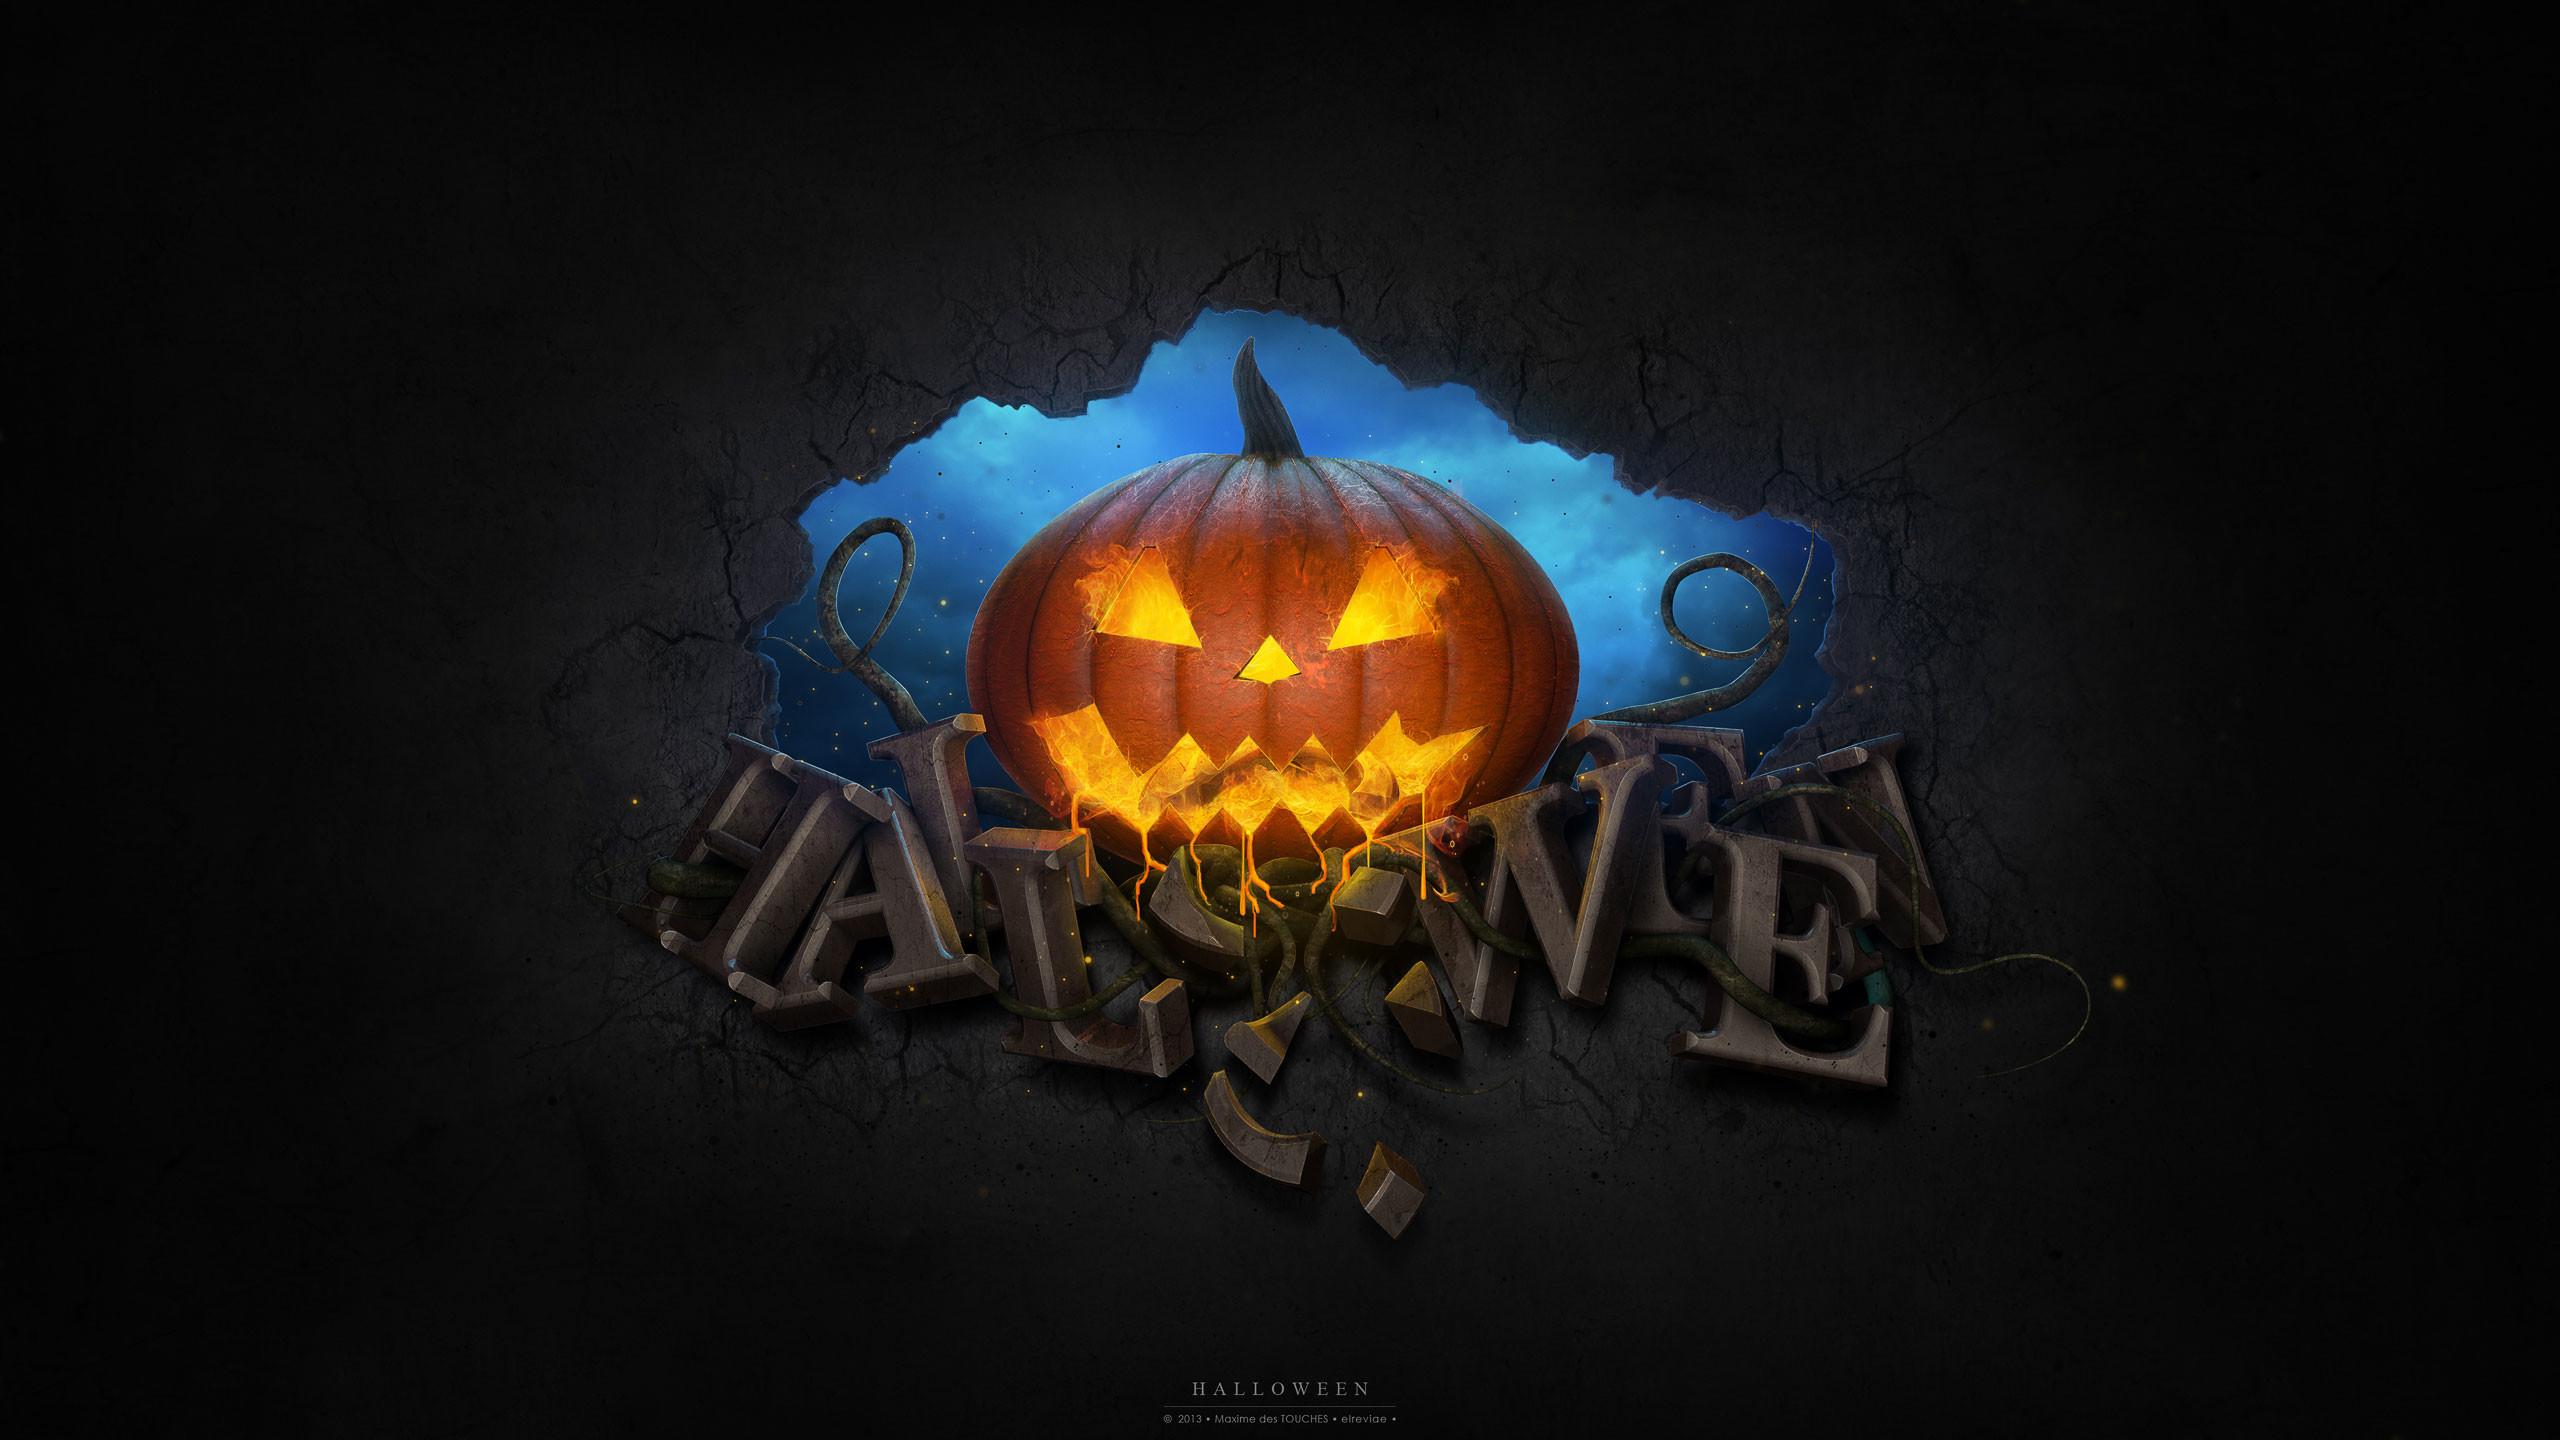 Res: 2560x1440, 2014 halloween Wallpaper HD Widescreen. Credit ·  2014_halloween_Wallpaper_HD_Widescreen